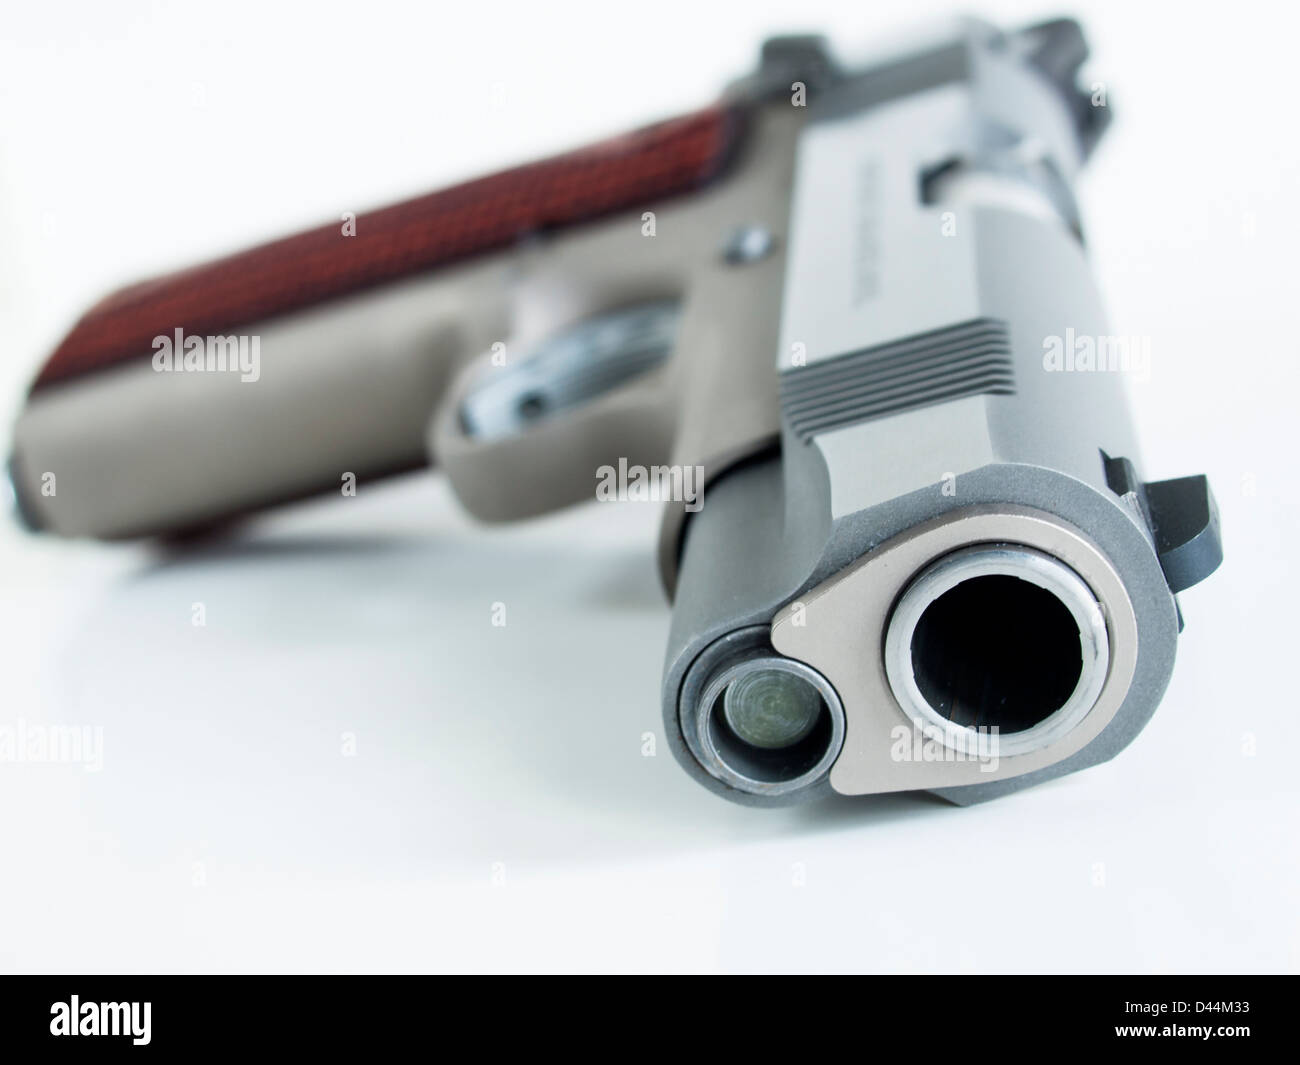 Colt 1911 Stockfotos & Colt 1911 Bilder - Alamy